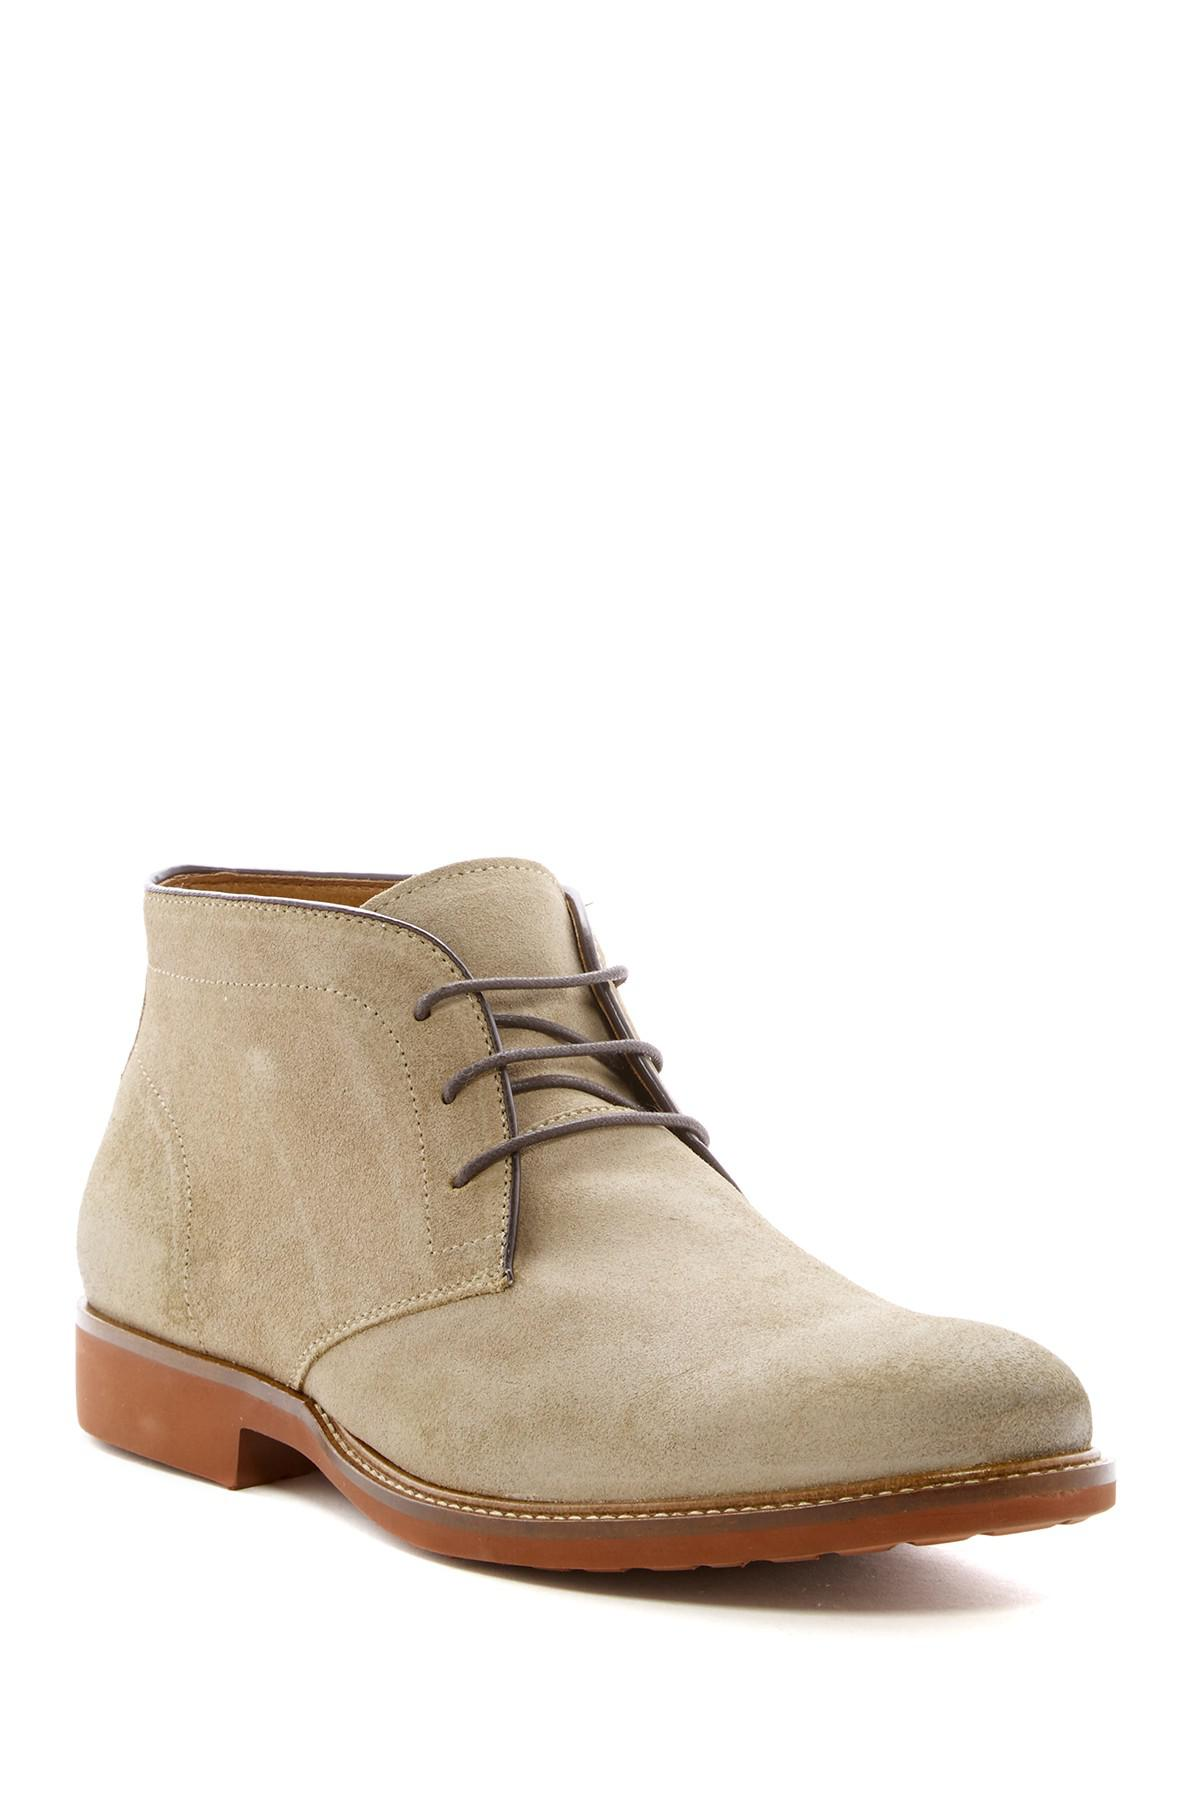 4700a15af33 Lyst - Gordon Rush Rowan Chukka Boot in Brown for Men